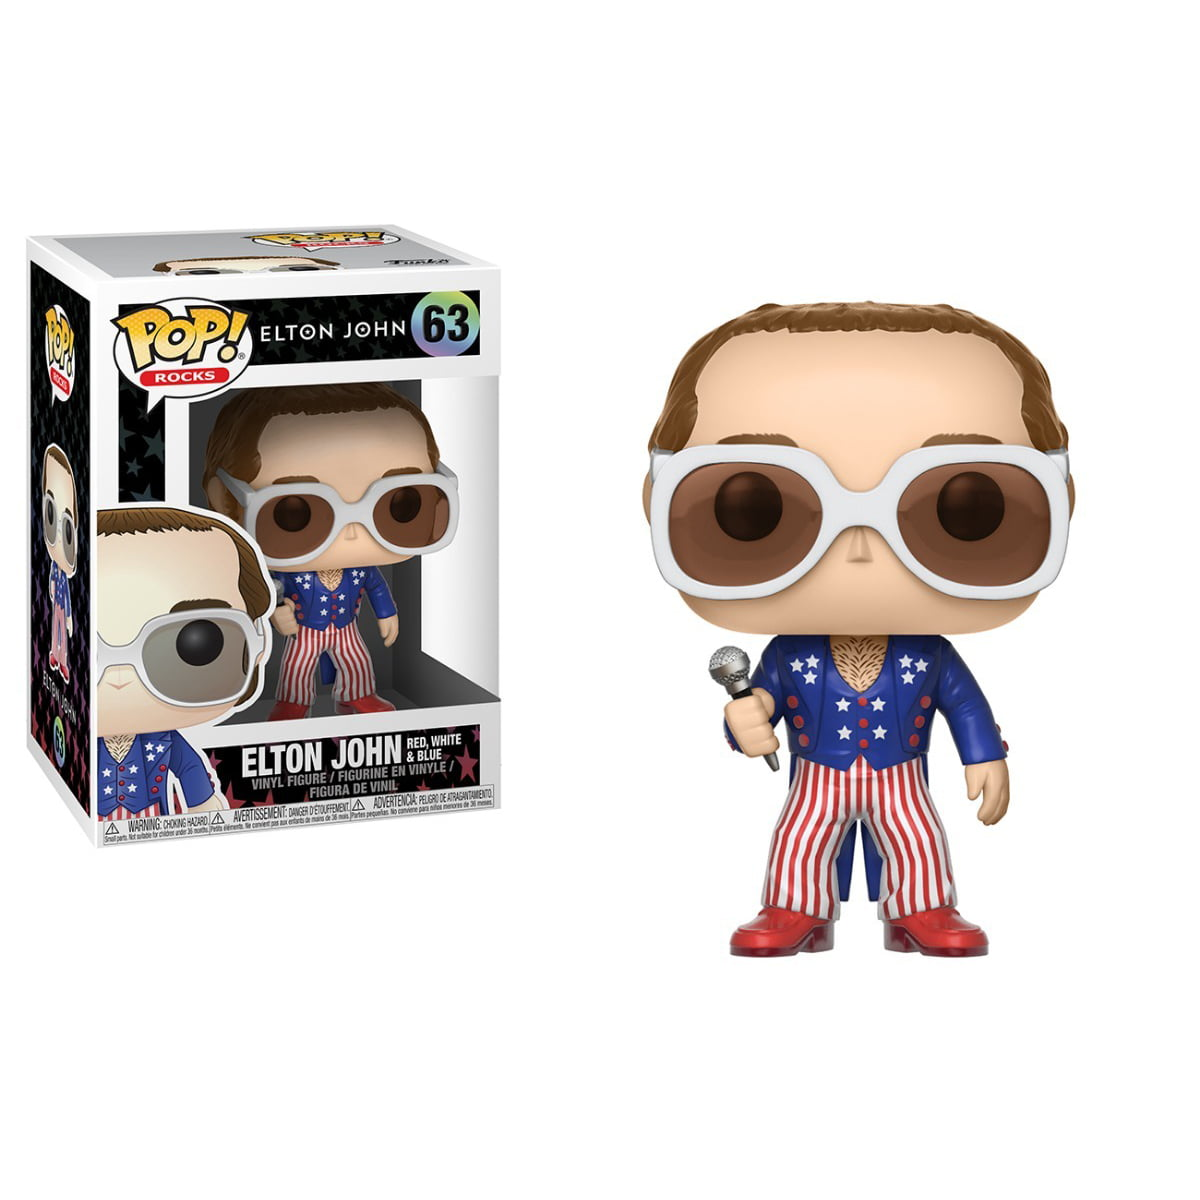 POP! ELTON JOHN - ELTON JOHN - RED, WHITE & BLUE